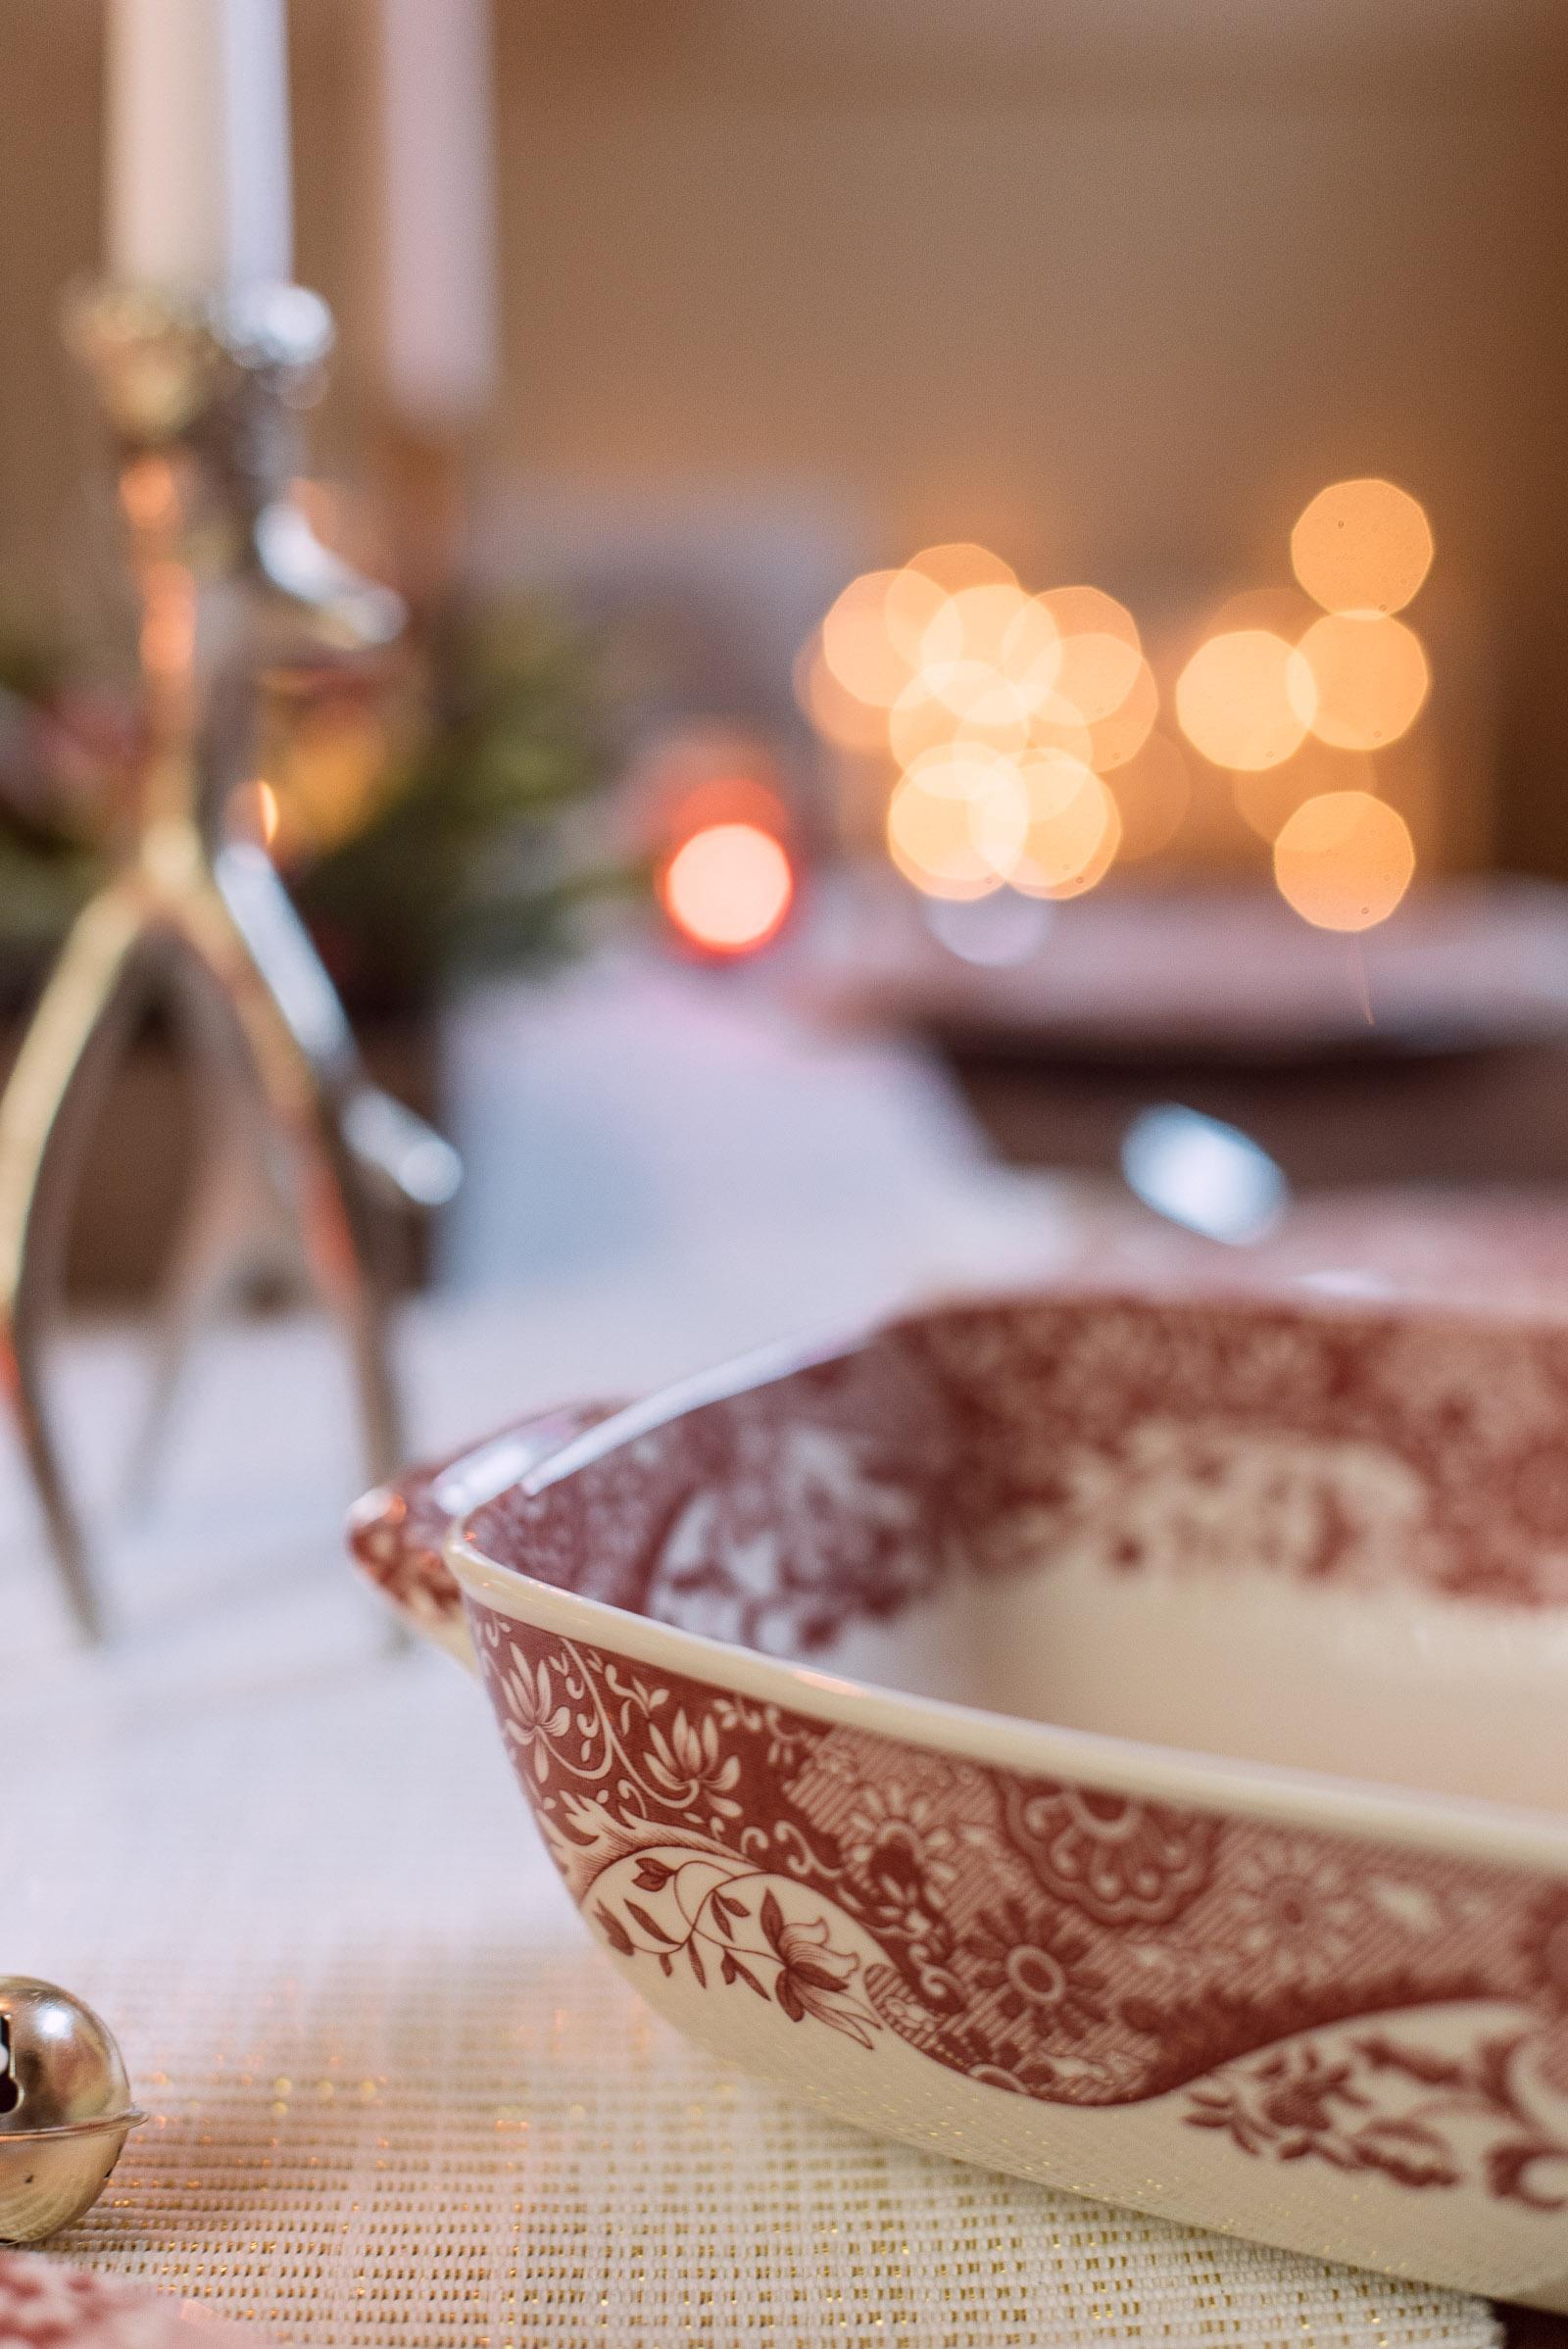 Christmas Table Decoration Ideas - Fifi McGee Interior Blogger